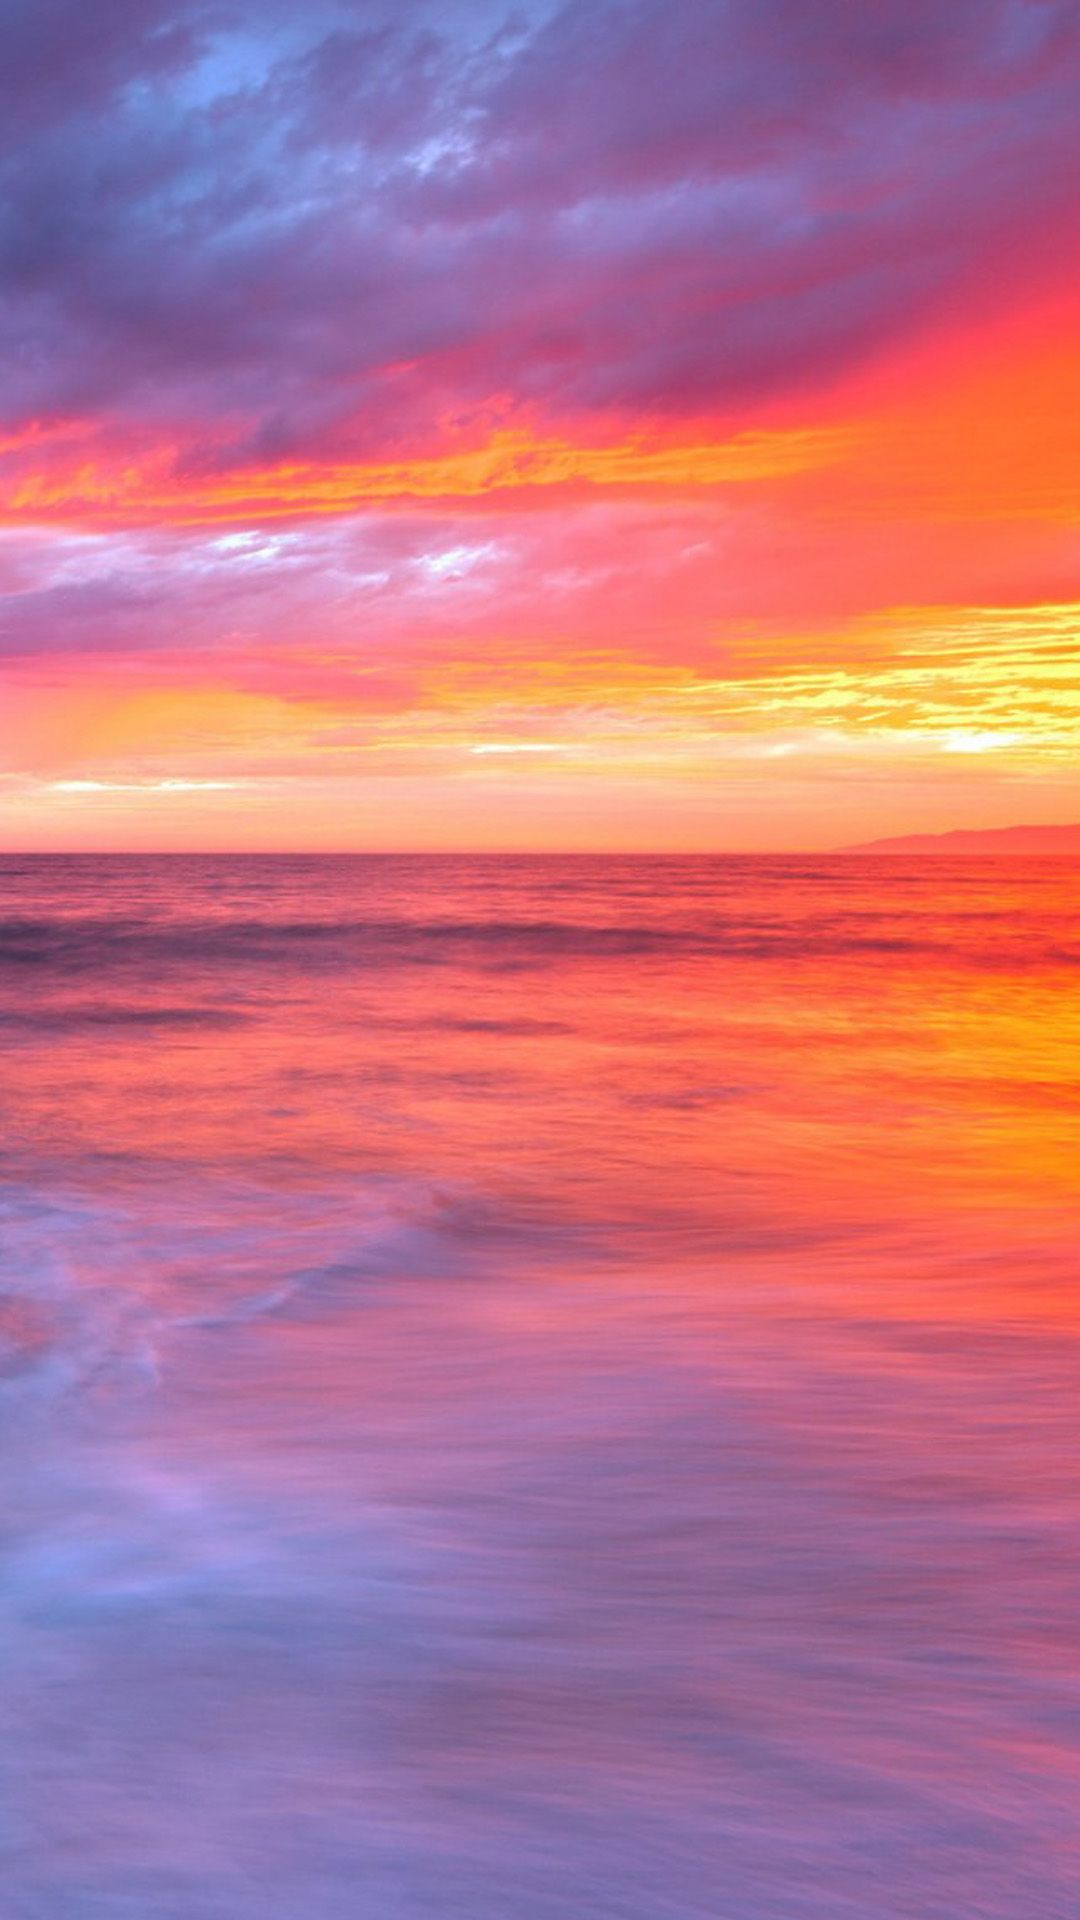 Karumba Point Sunset Caravan Park Magnificent Sunrises And Sunsets Birds Wpme P3EmEt Vu